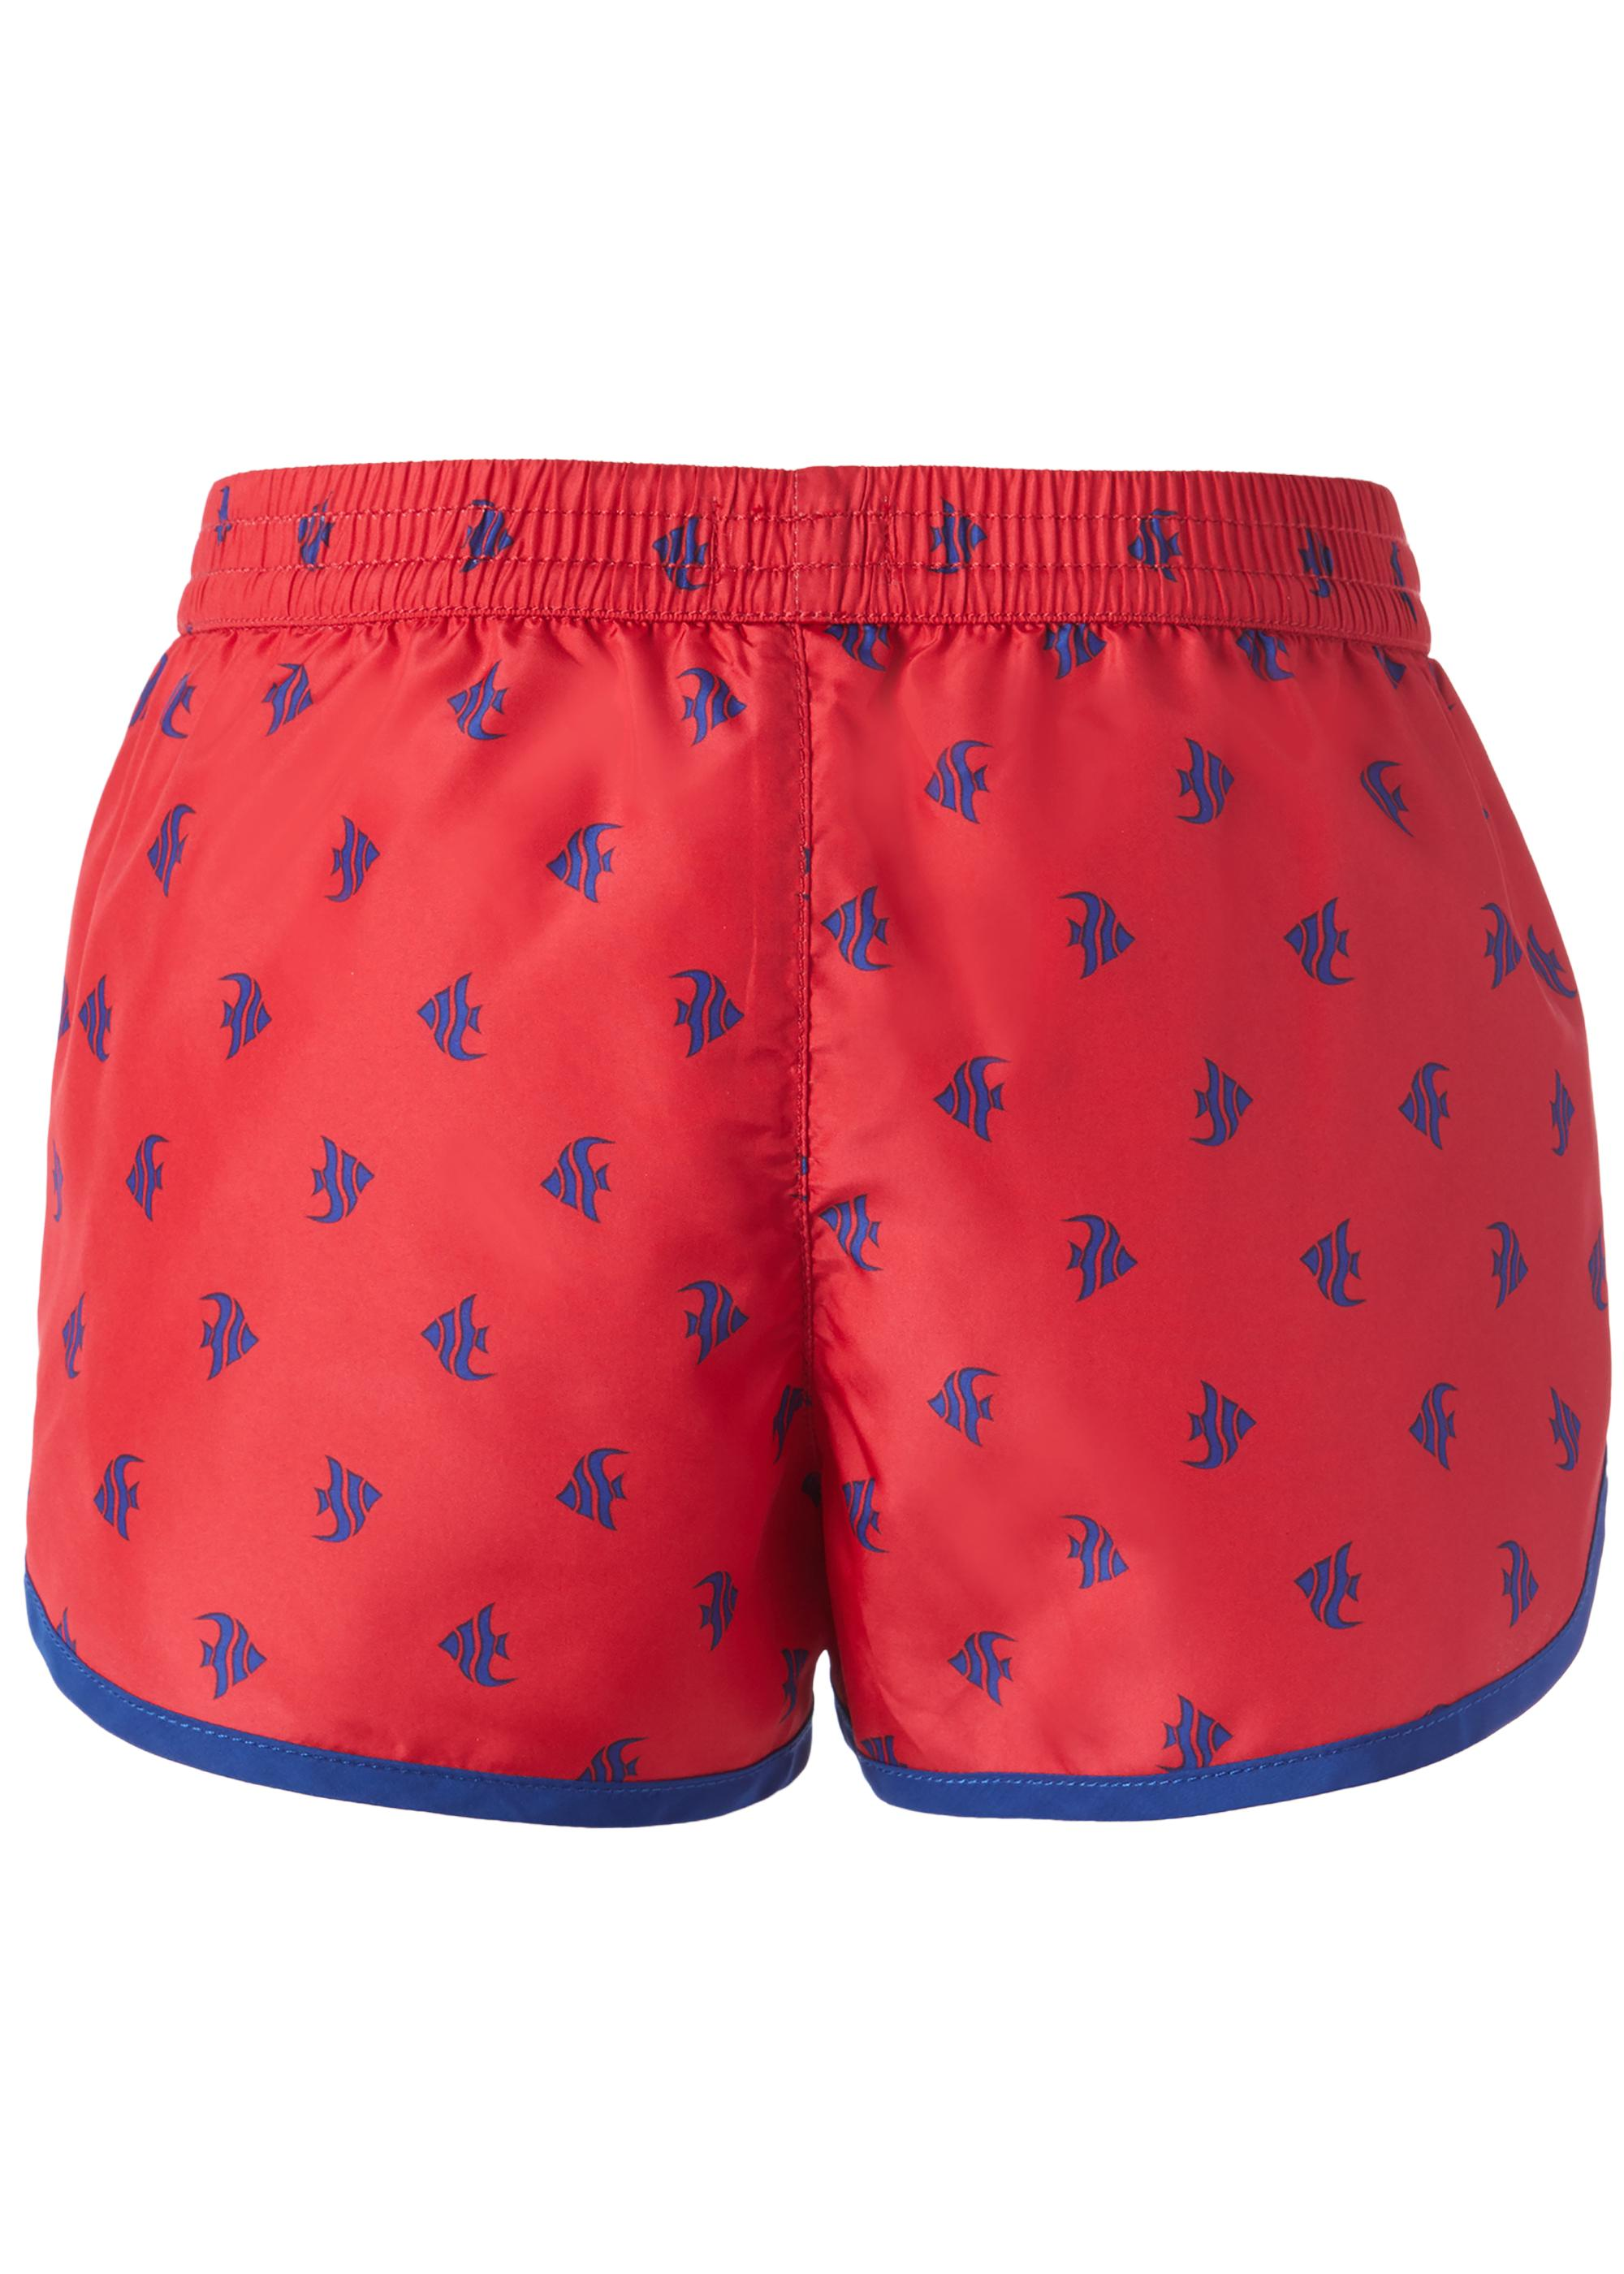 6e978ac6817 Boys  Swimming Shorts with Pattern Print - Calzedonia